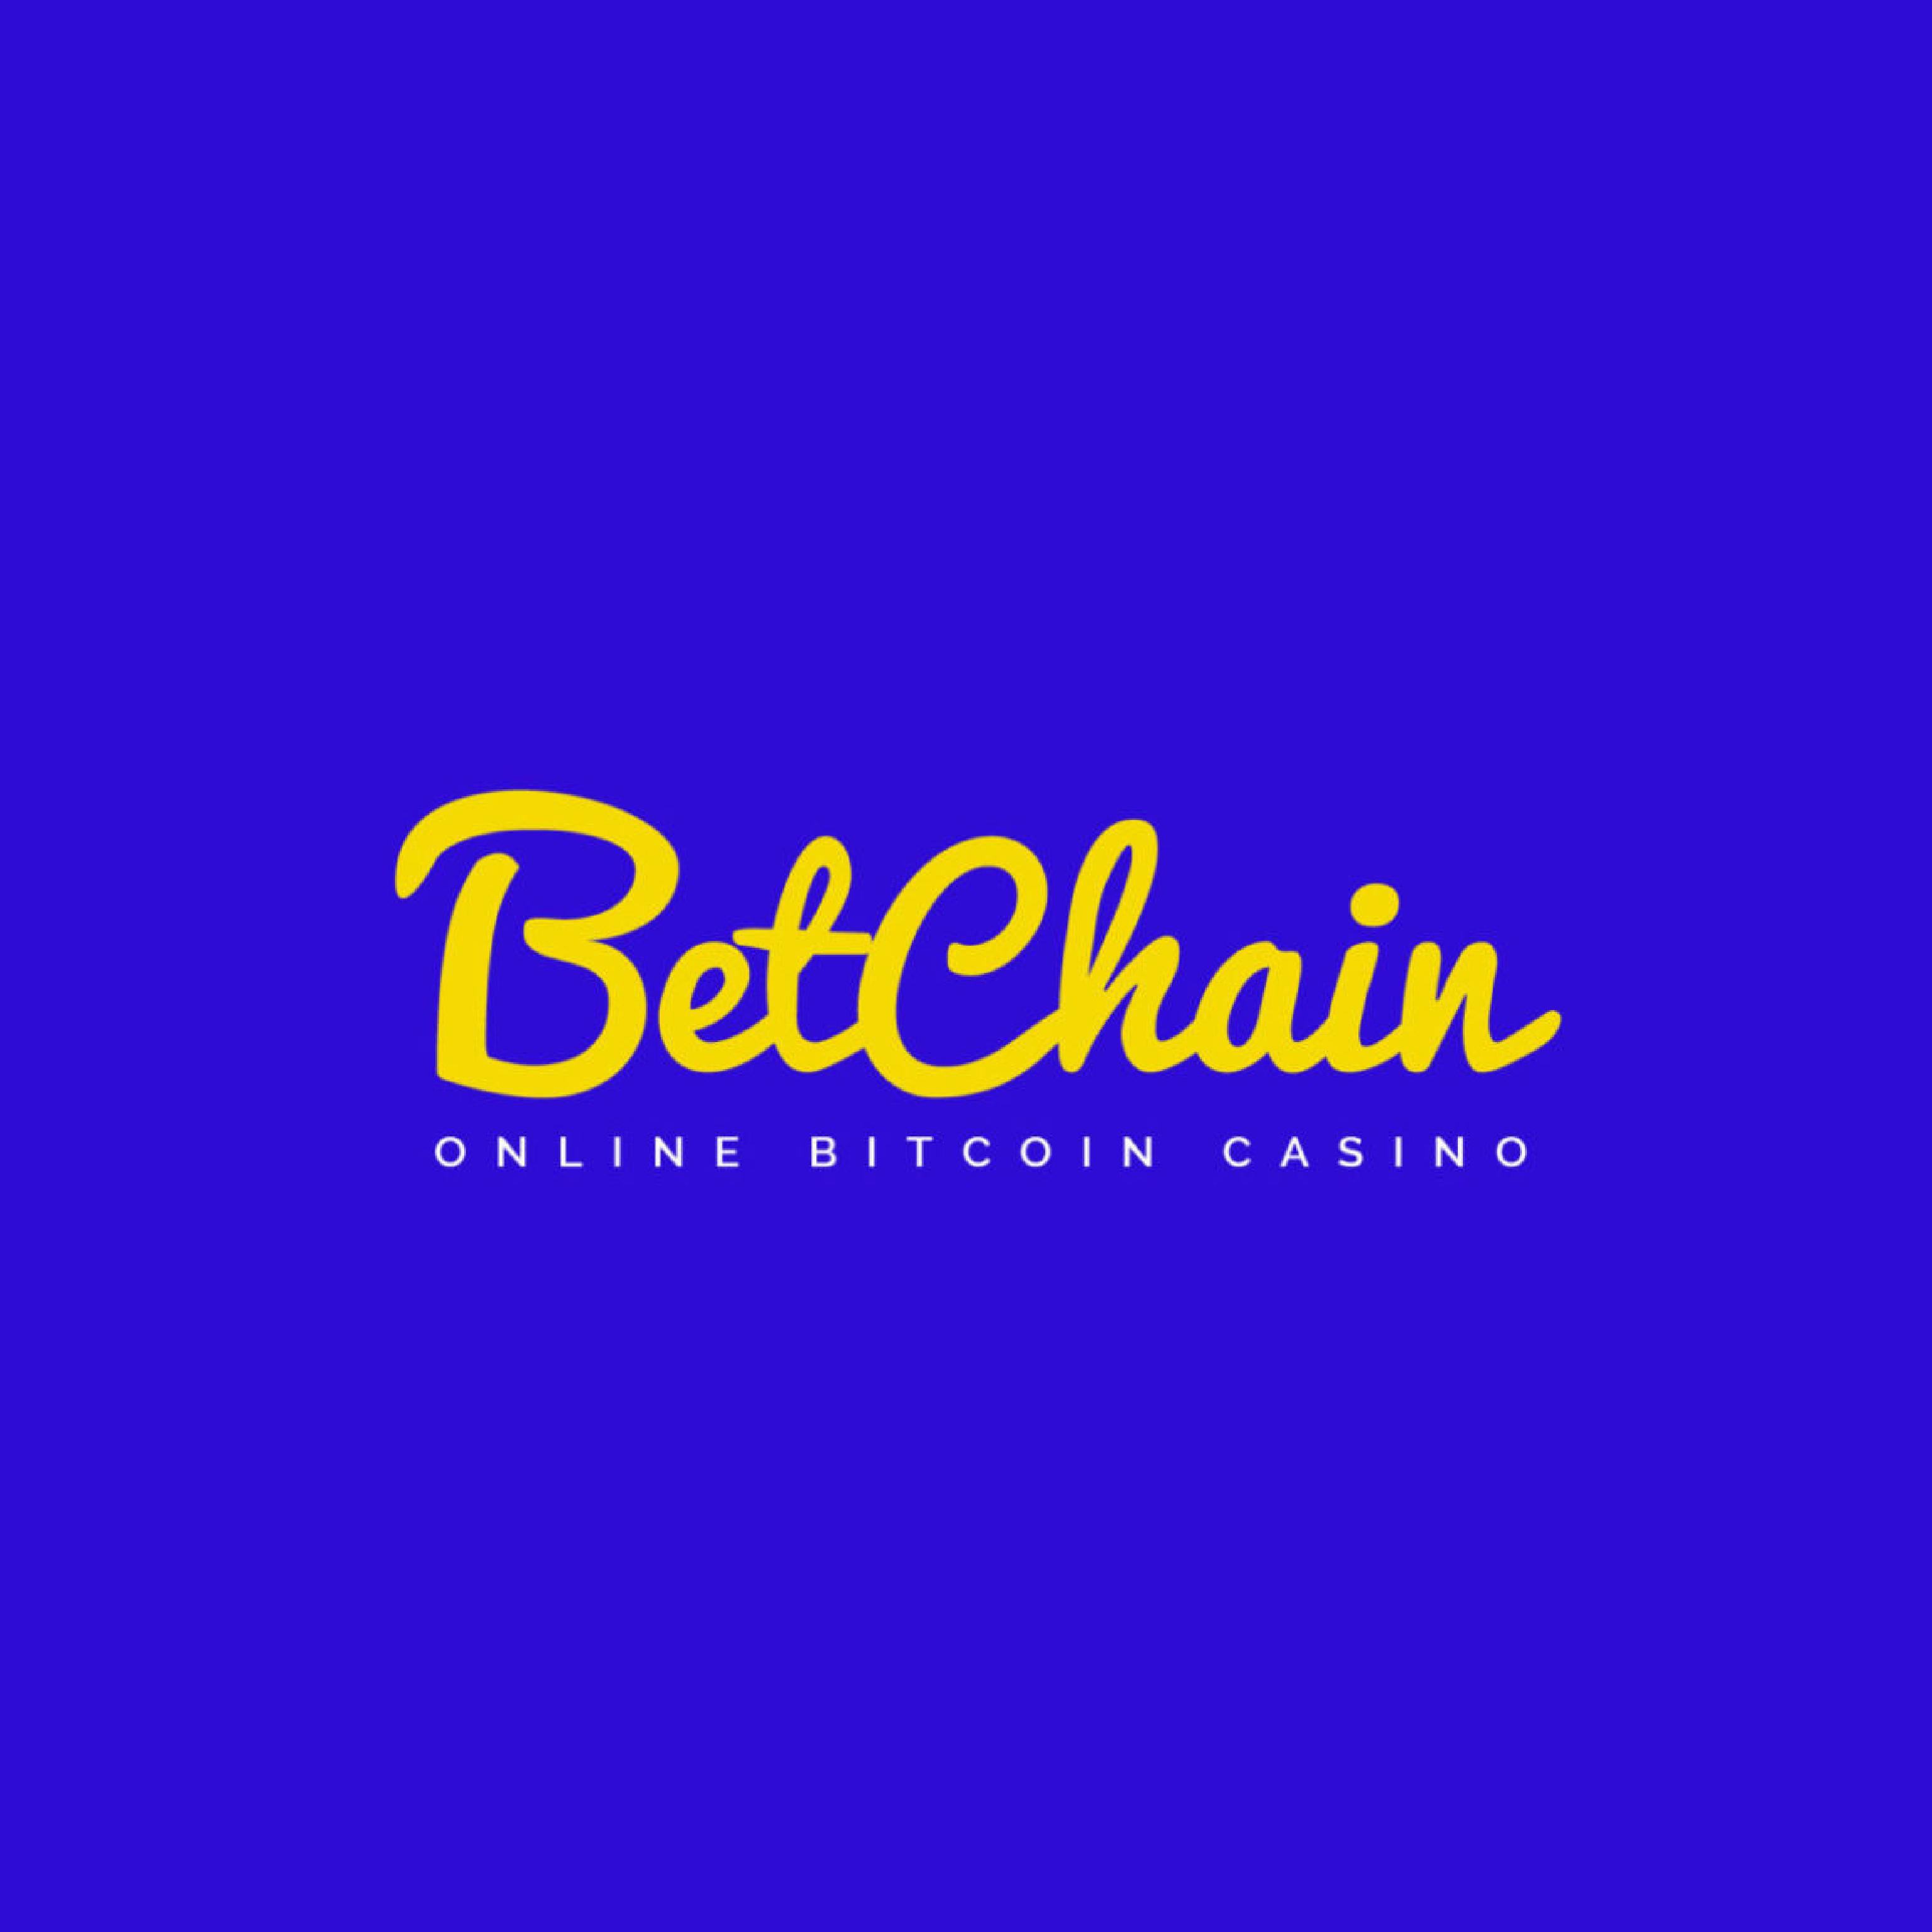 Bitcoin casino top 10